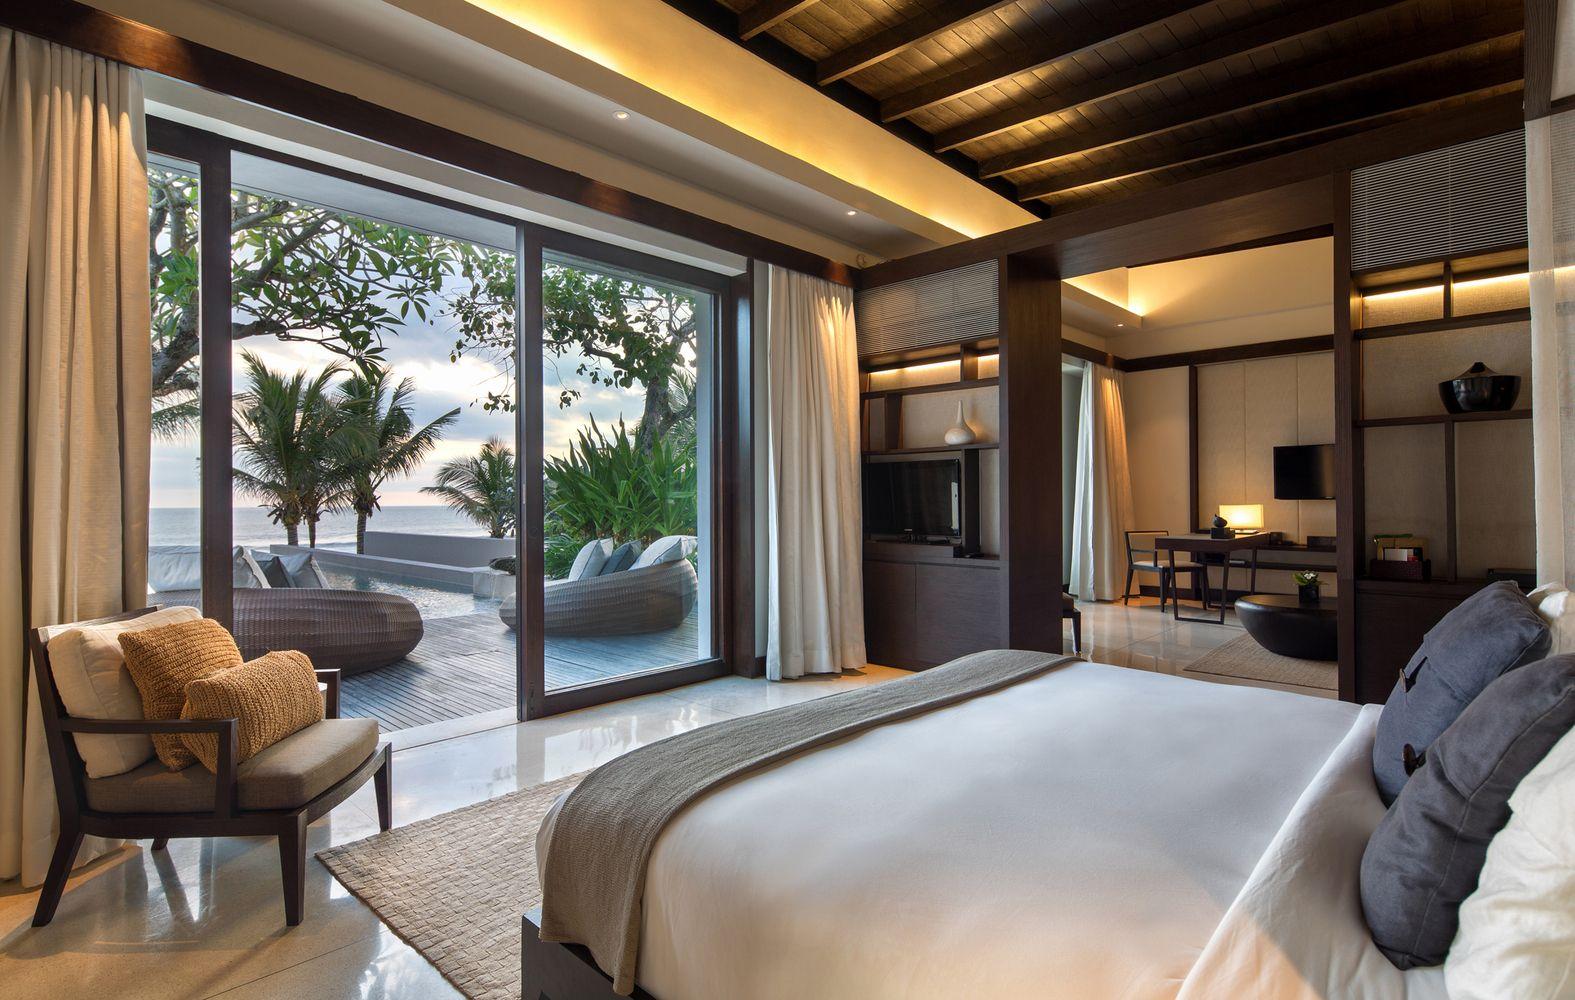 Soori Bali Scda Architects Luxurious Bedrooms Bali Bedroom